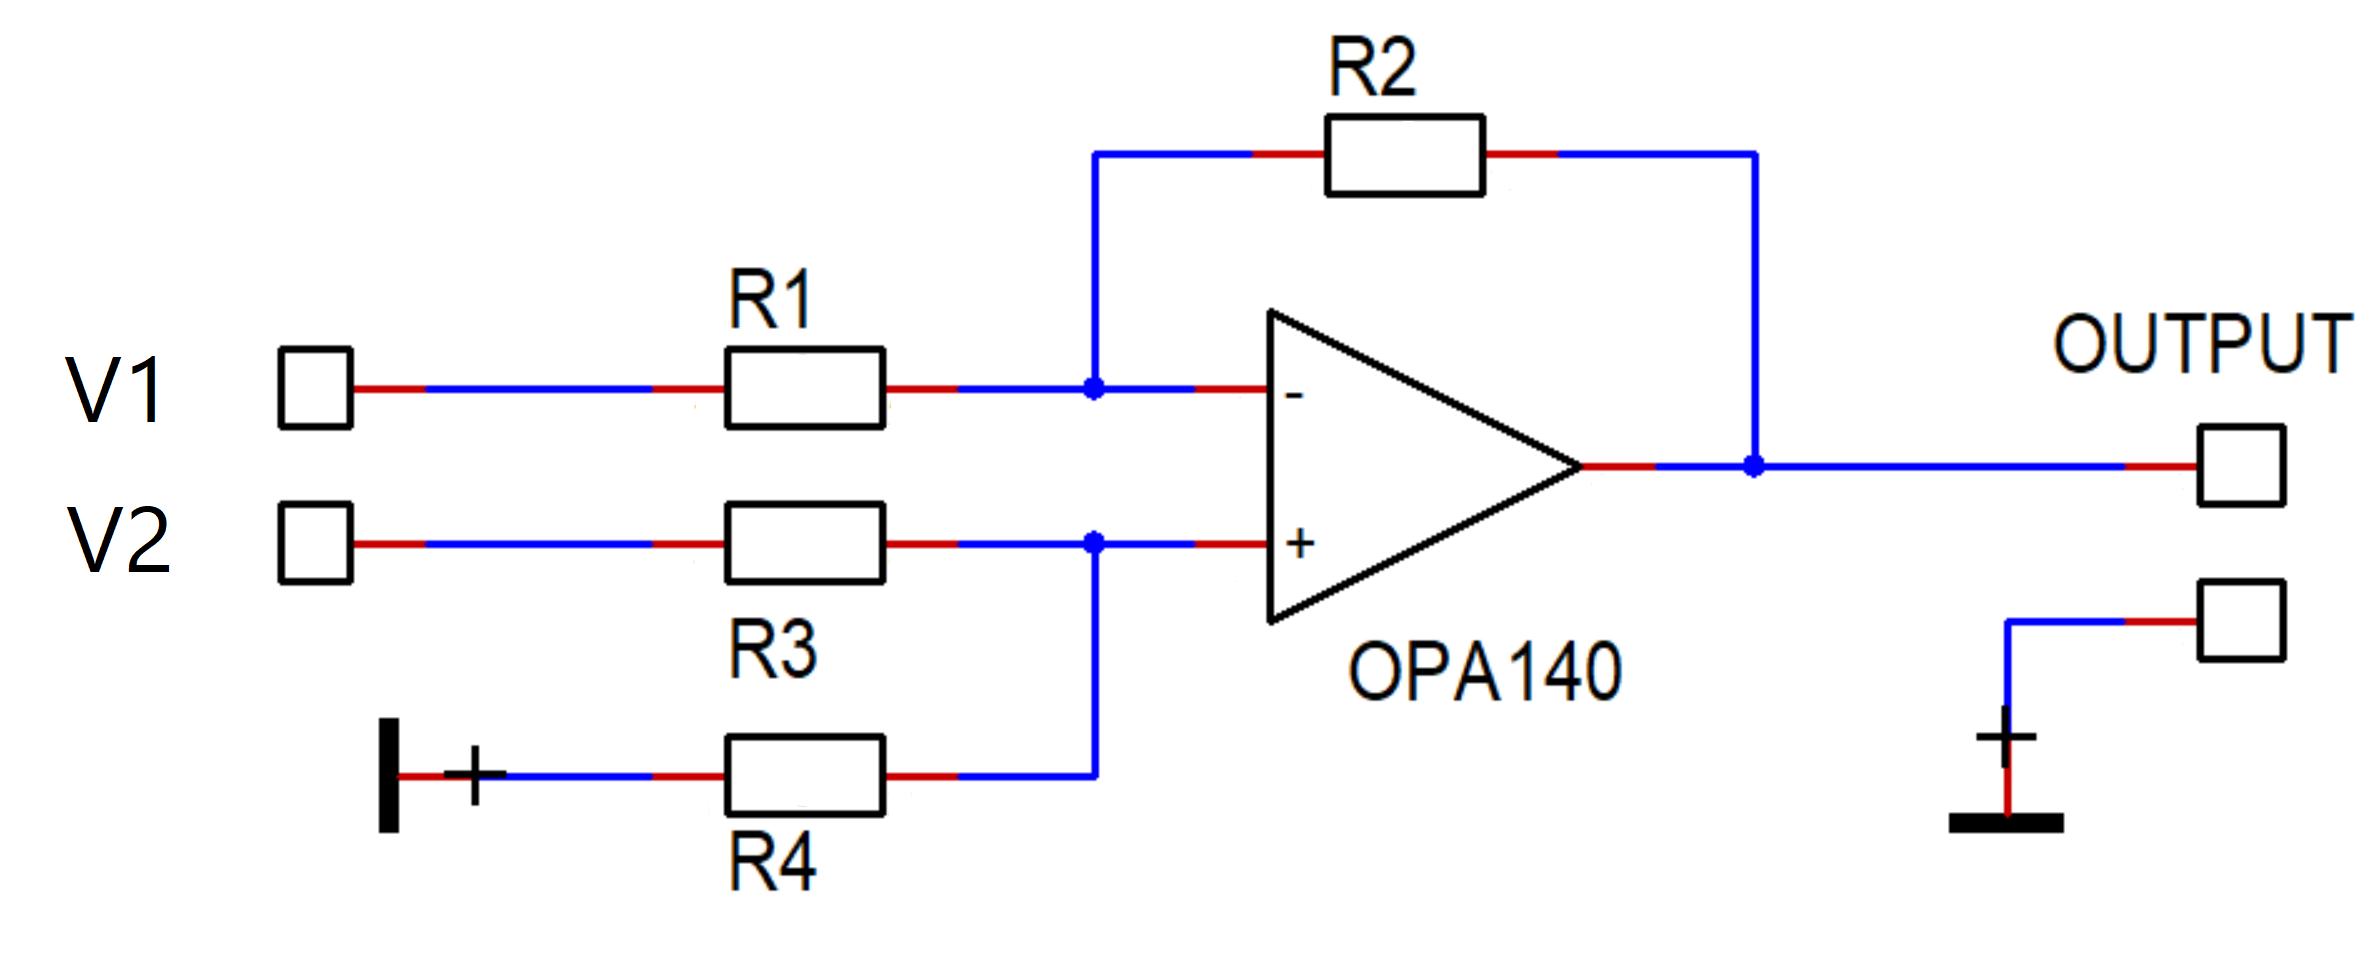 Differential Amplifier Gain Calculator